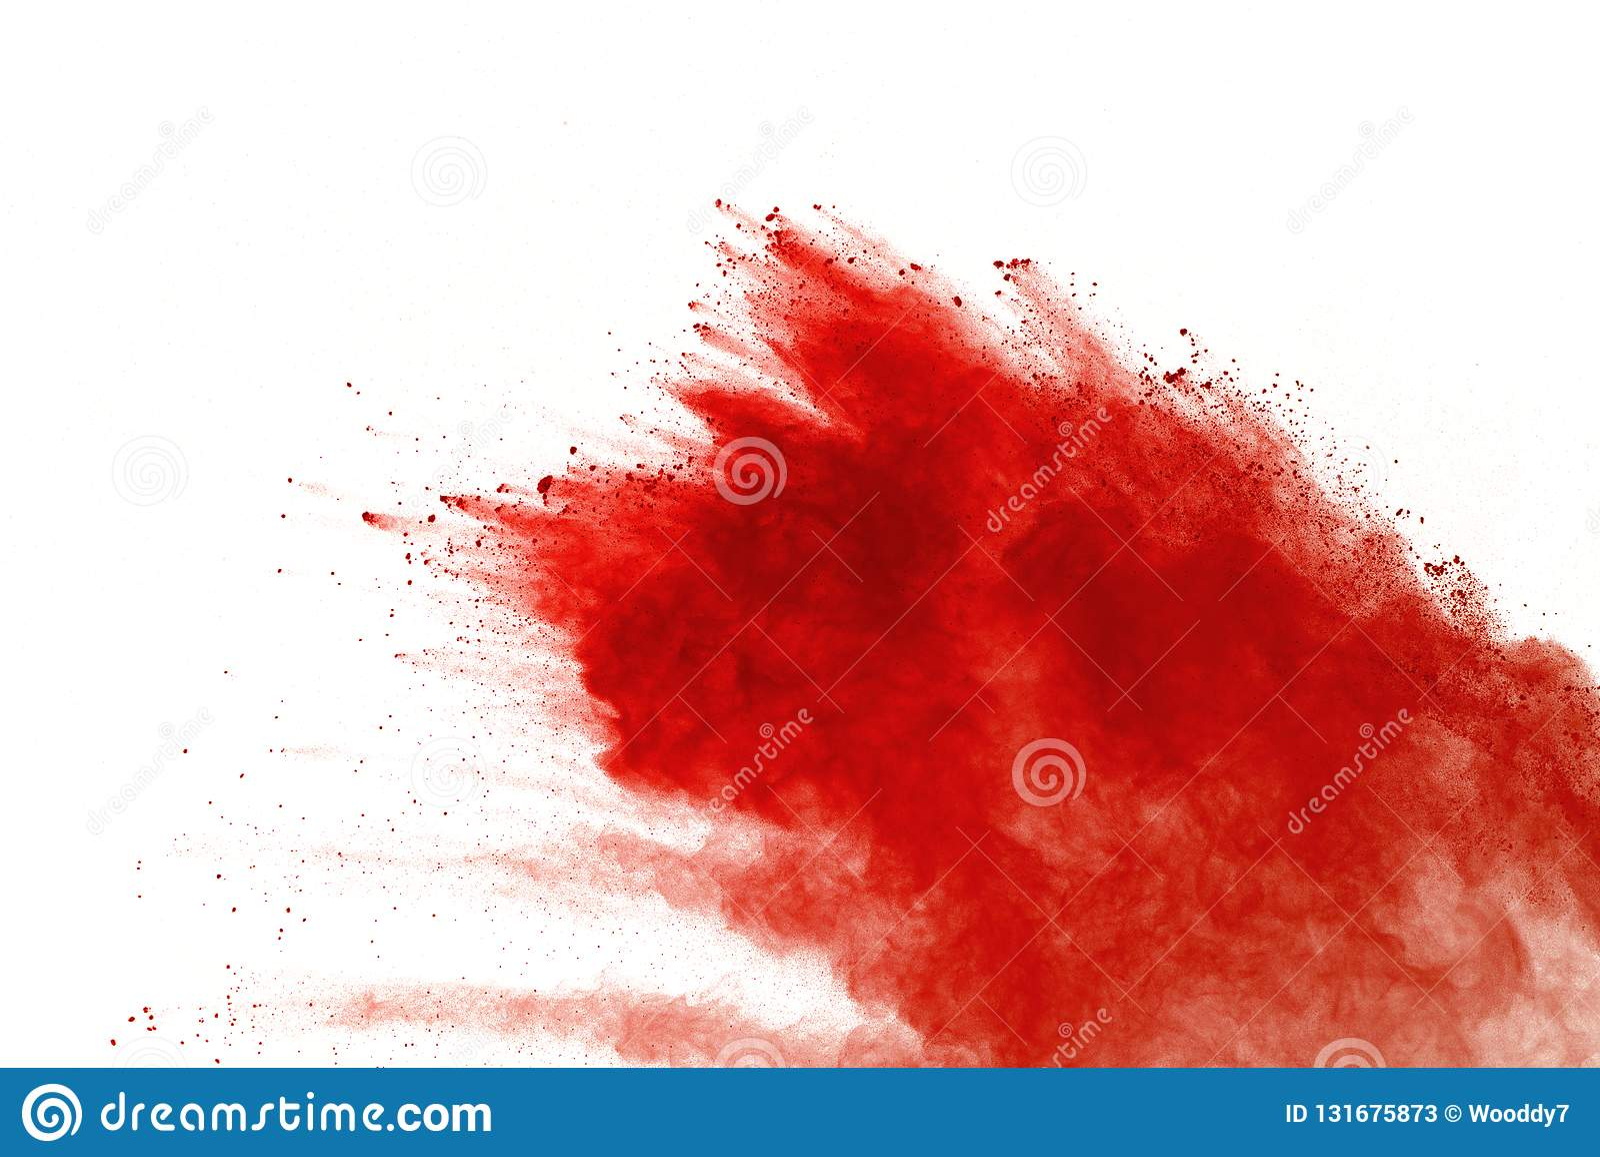 Red powder explosion on white background. Paint Holi